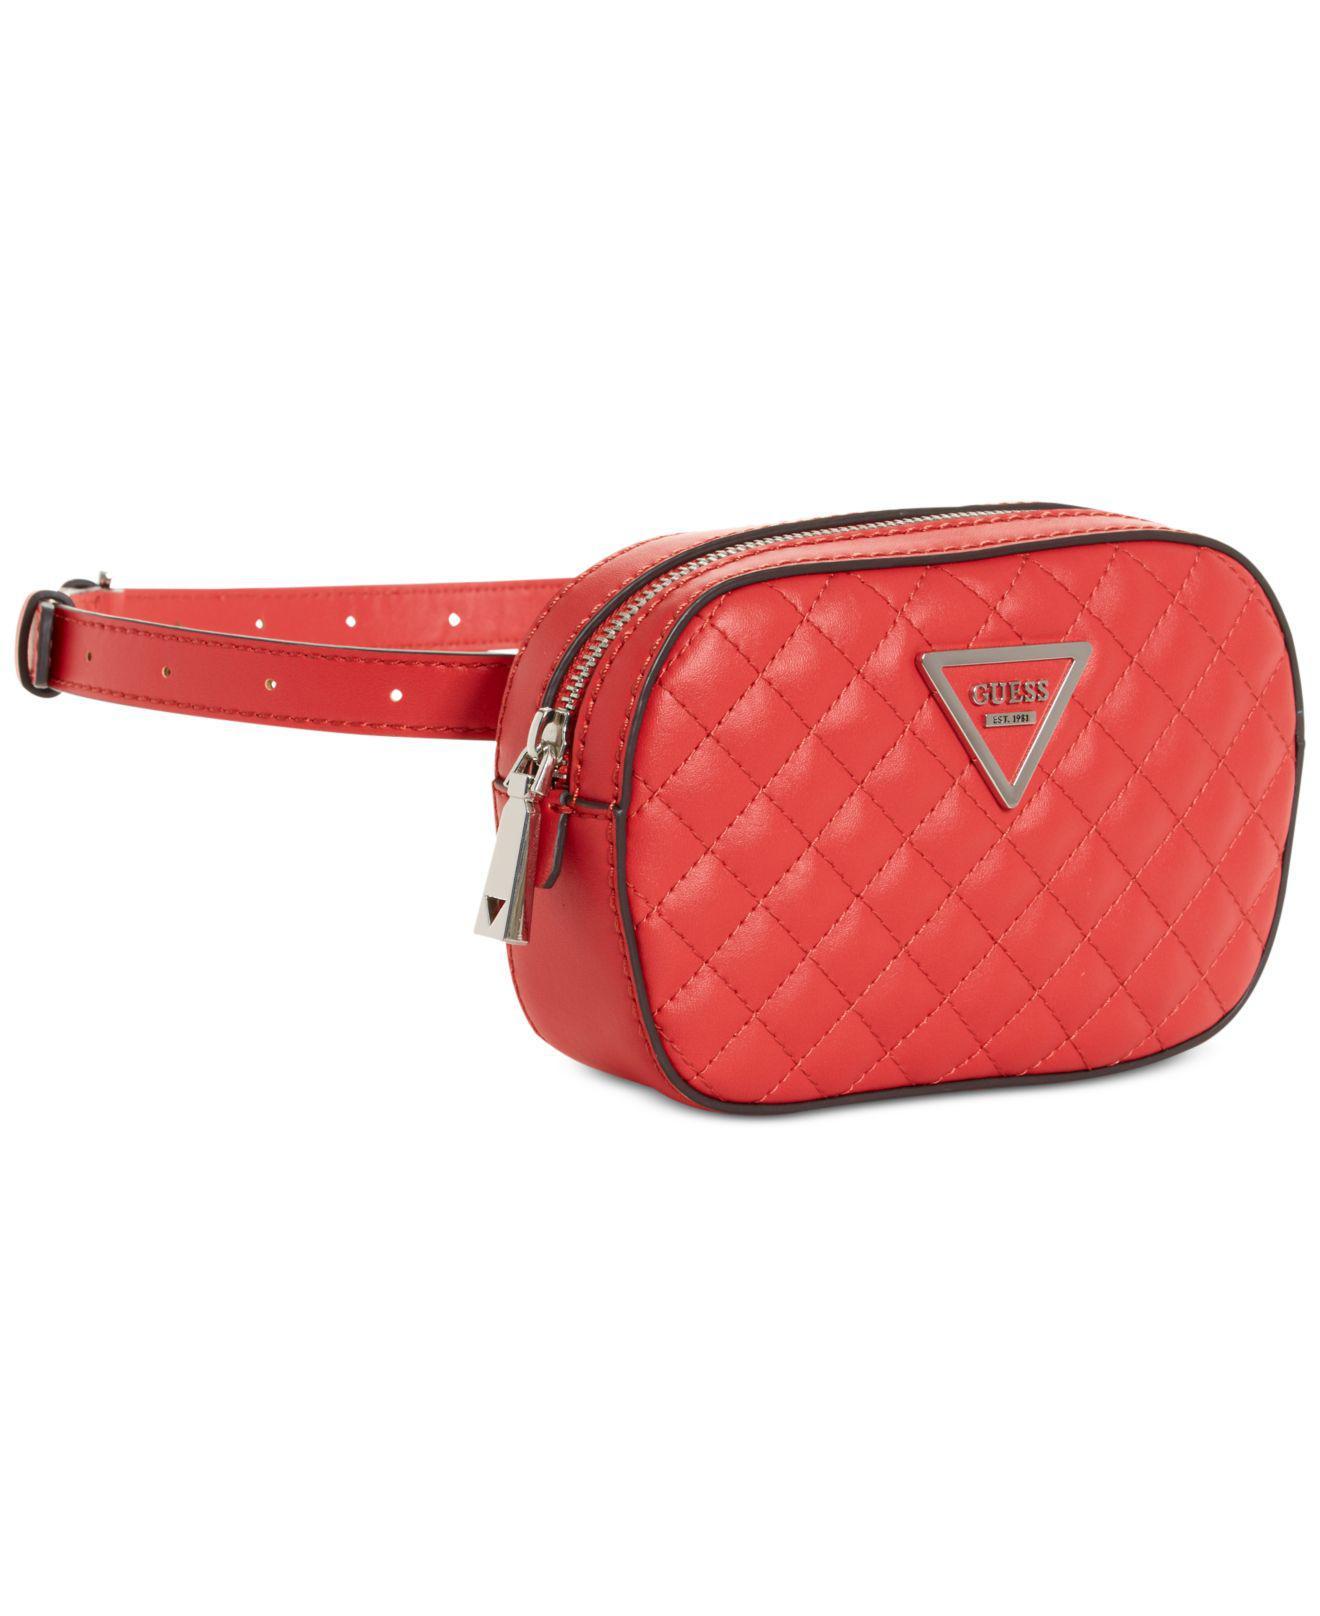 732a28aa95 Lyst - Guess Varsity Pop Mini Belt Bag in Red